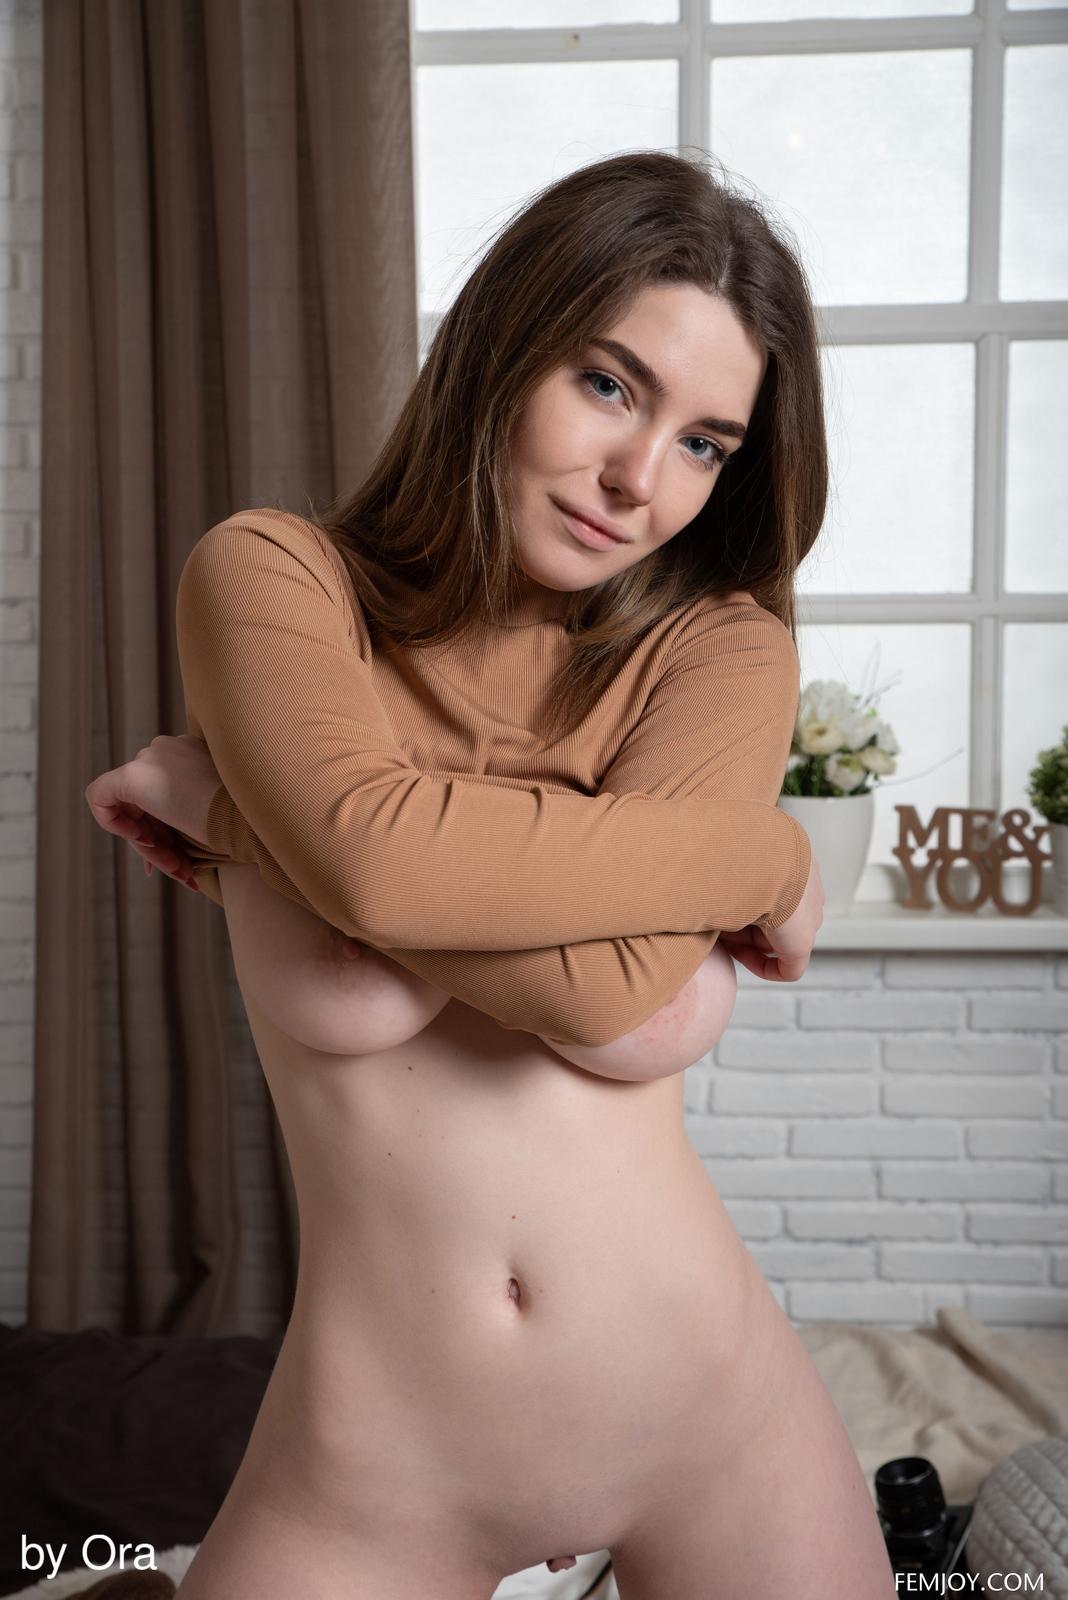 kiere-bodysuit-boobs-naked-socks-bedroom-femjoy-05